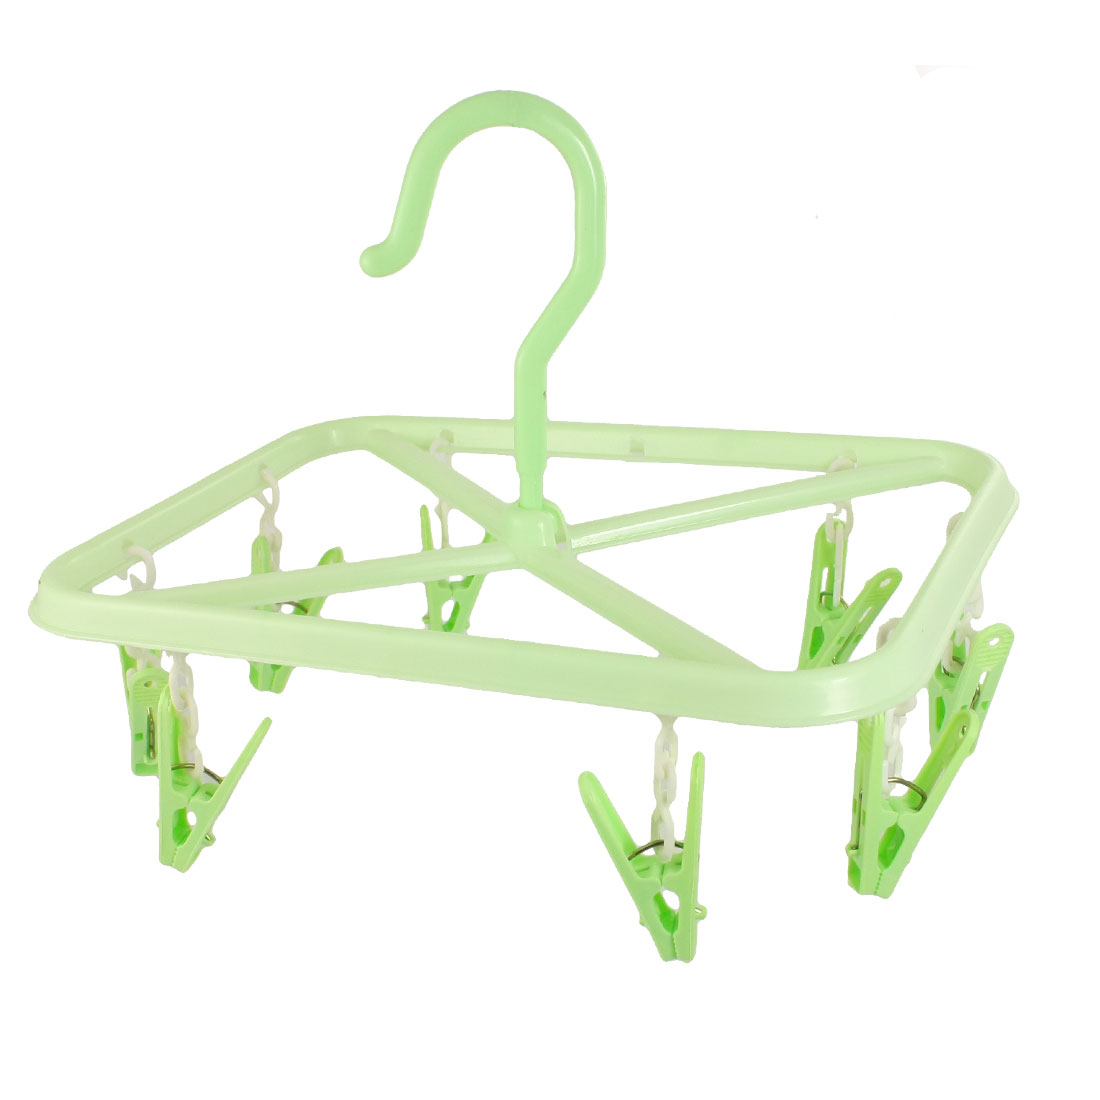 Unique Bargains Rectangle Frame Light Green 8 Pegs Plastic Clothes Hanger + Hook